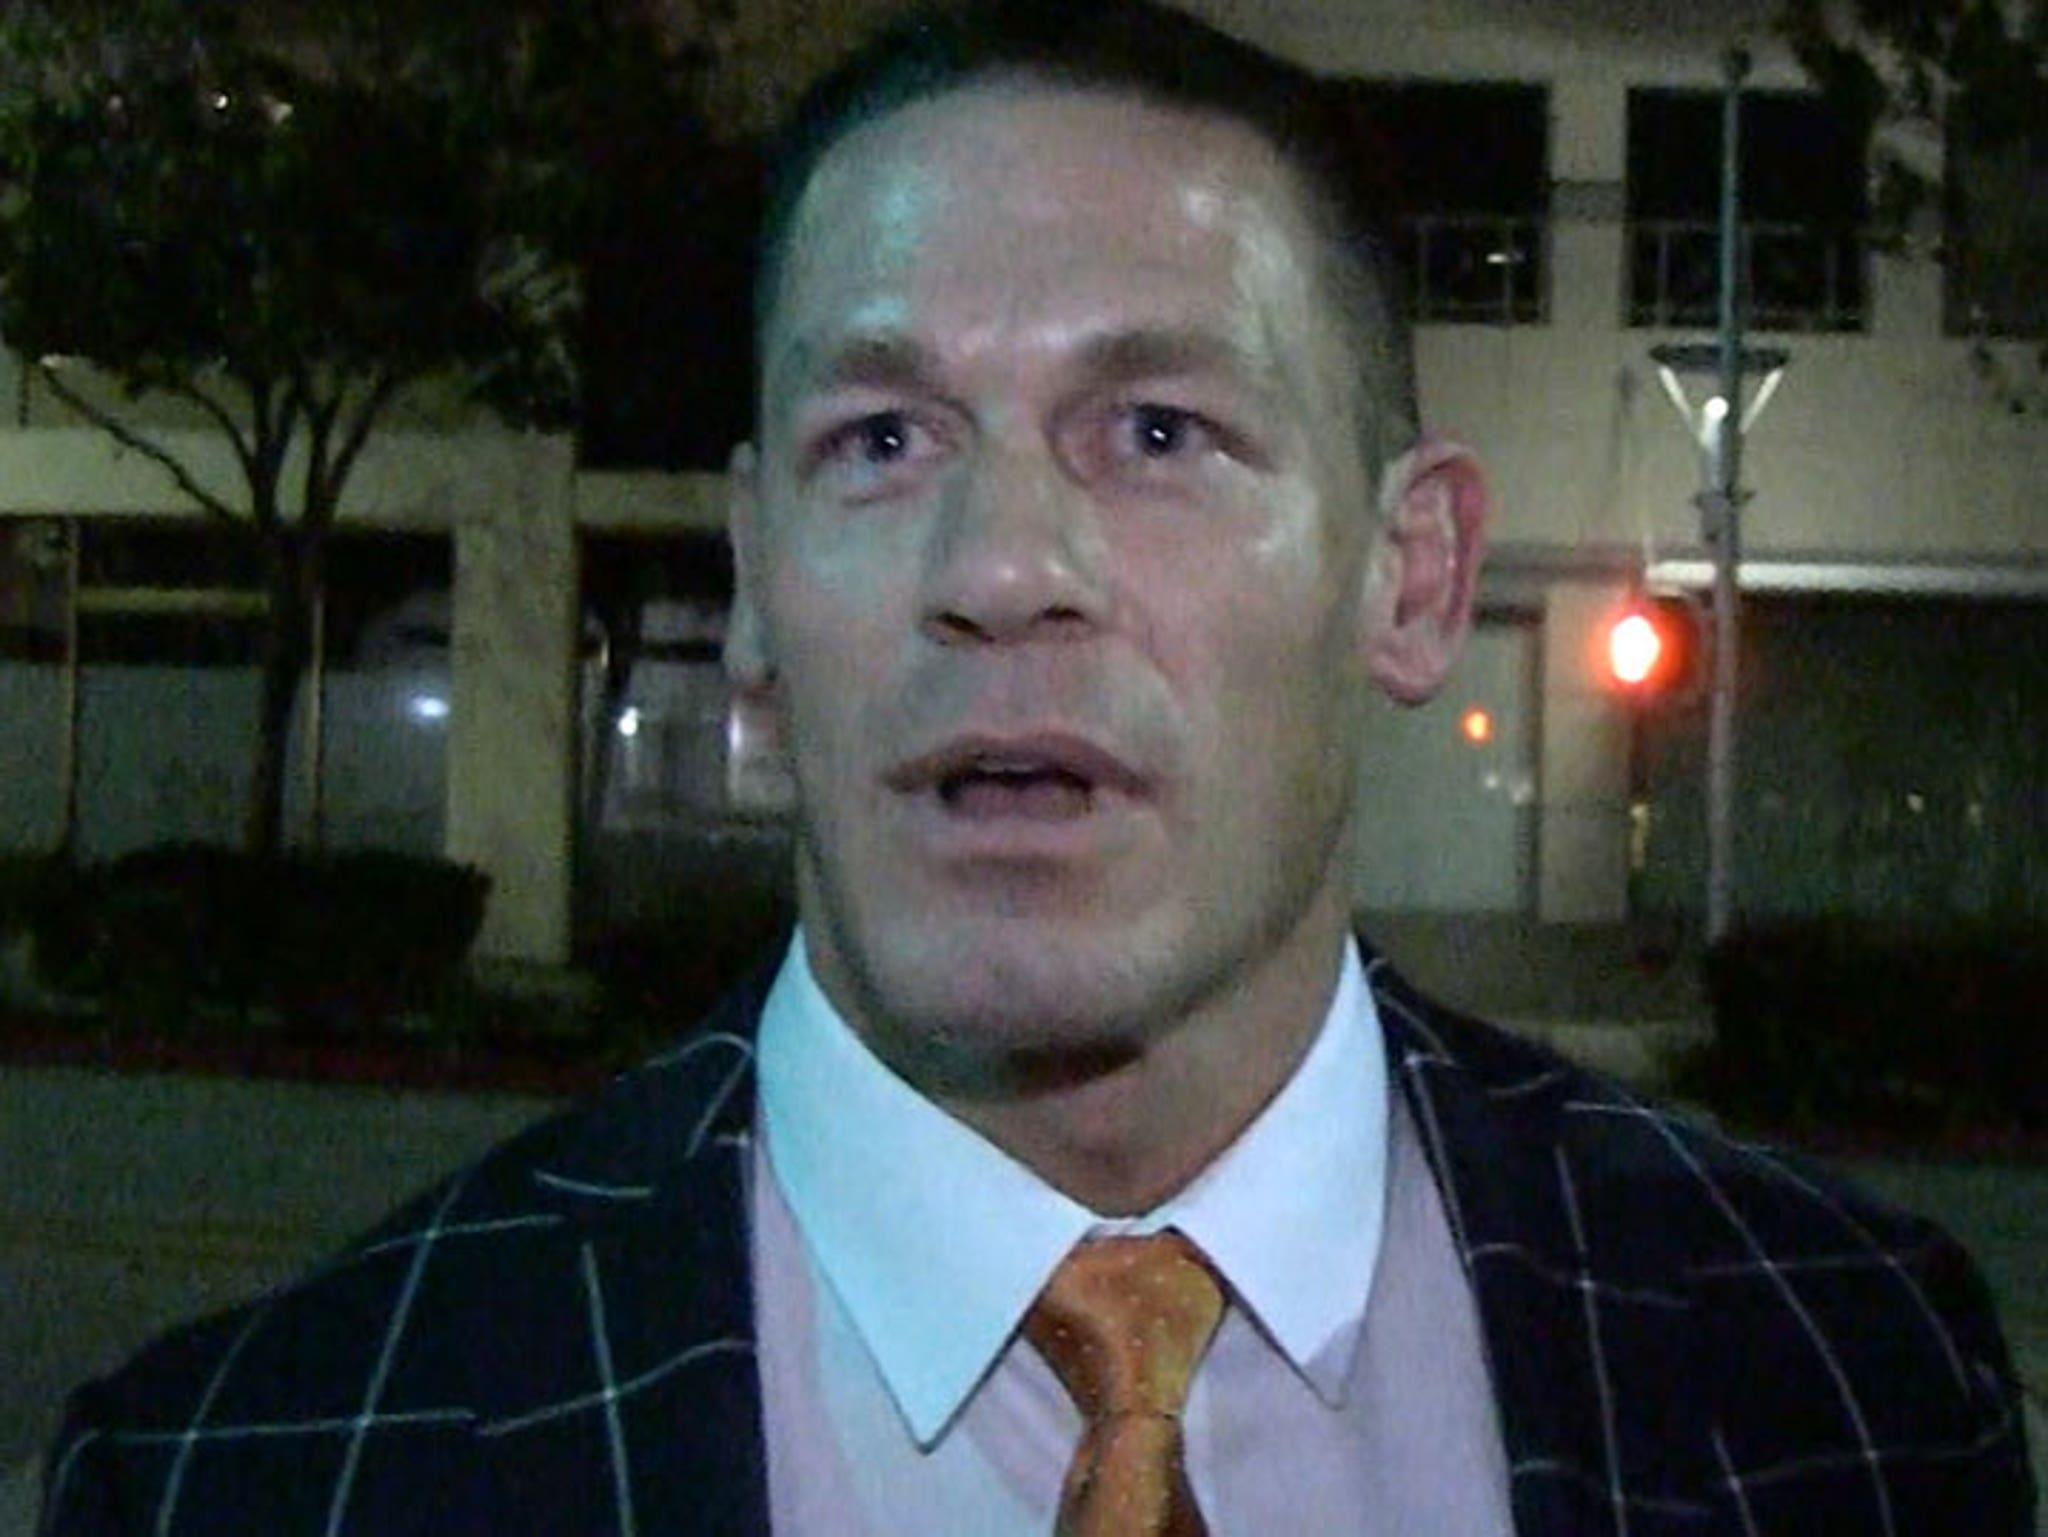 John Cena Says WWE Could Have A Transgender Wrestler with